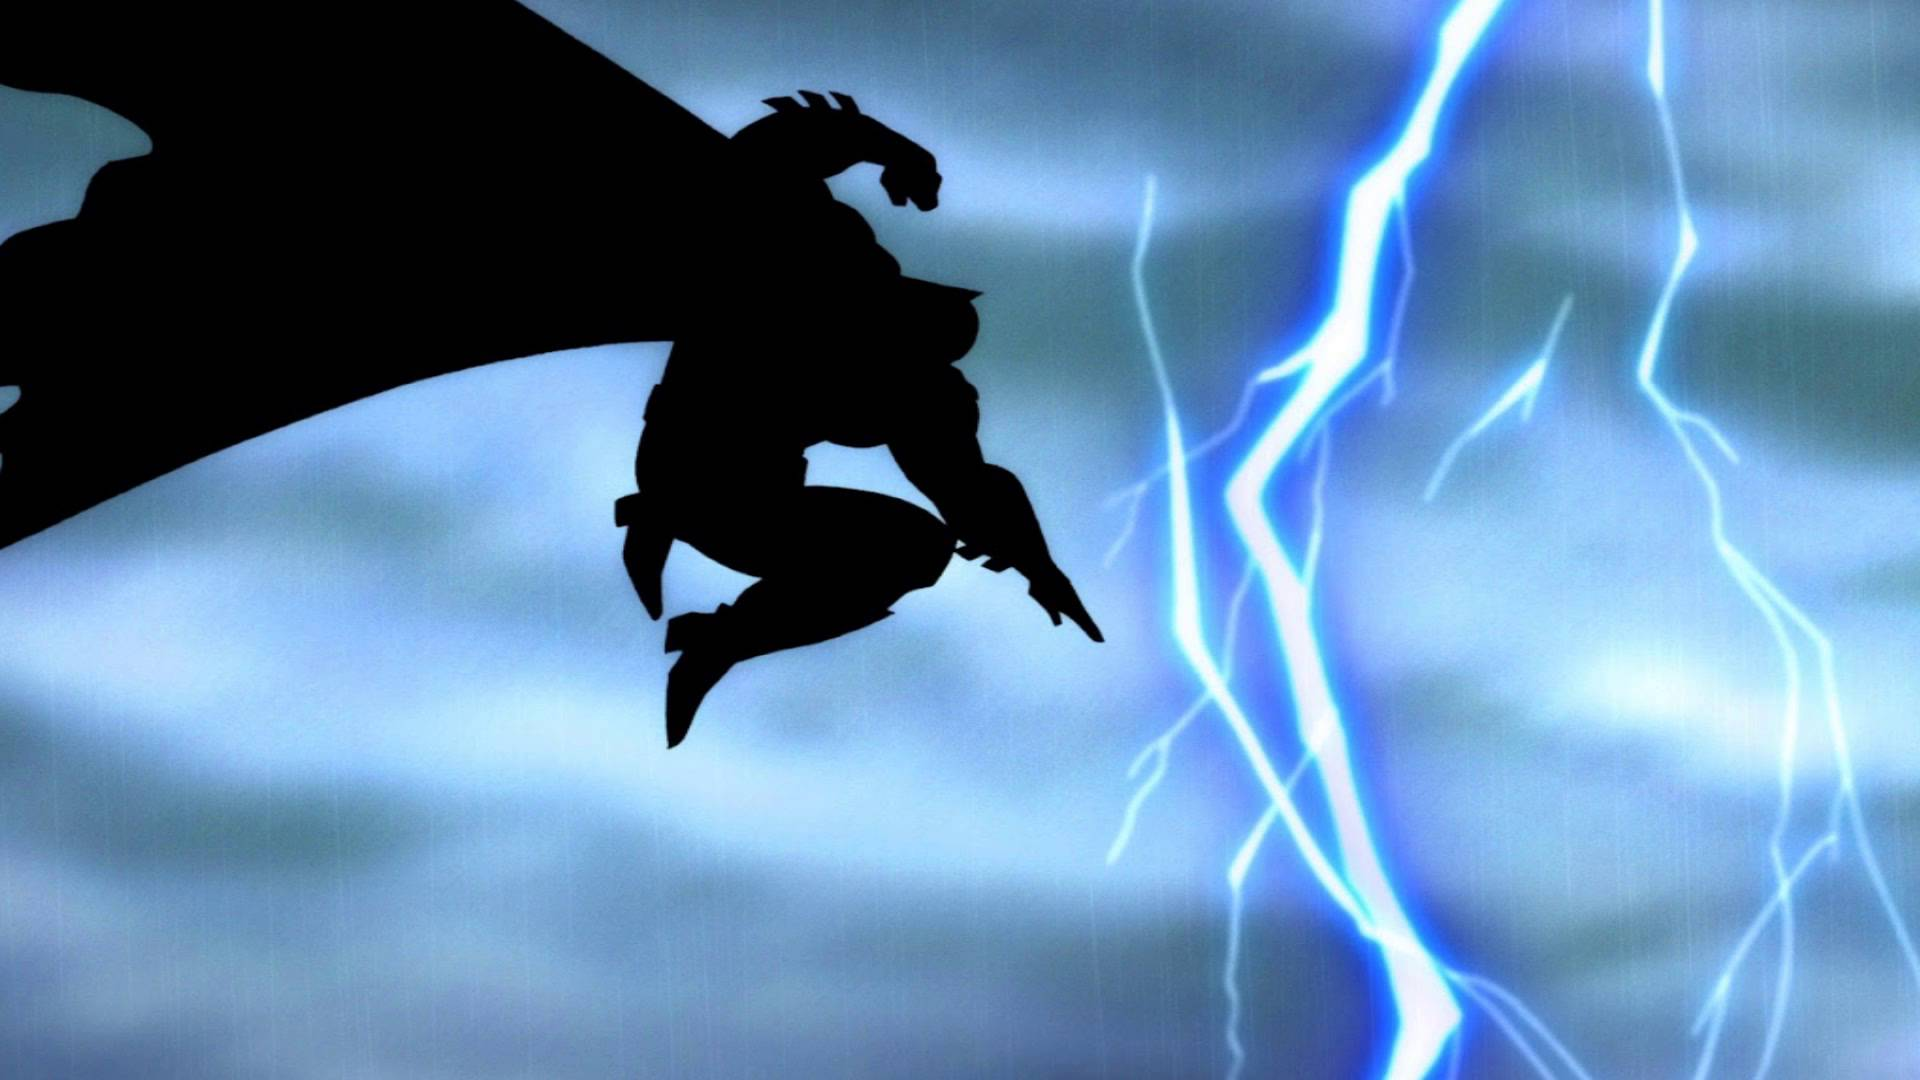 Batman: The Dark Knight Returns Wallpapers | Batman: The Dark ...: wallpapercave.com/the-dark-knight-returns-wallpaper